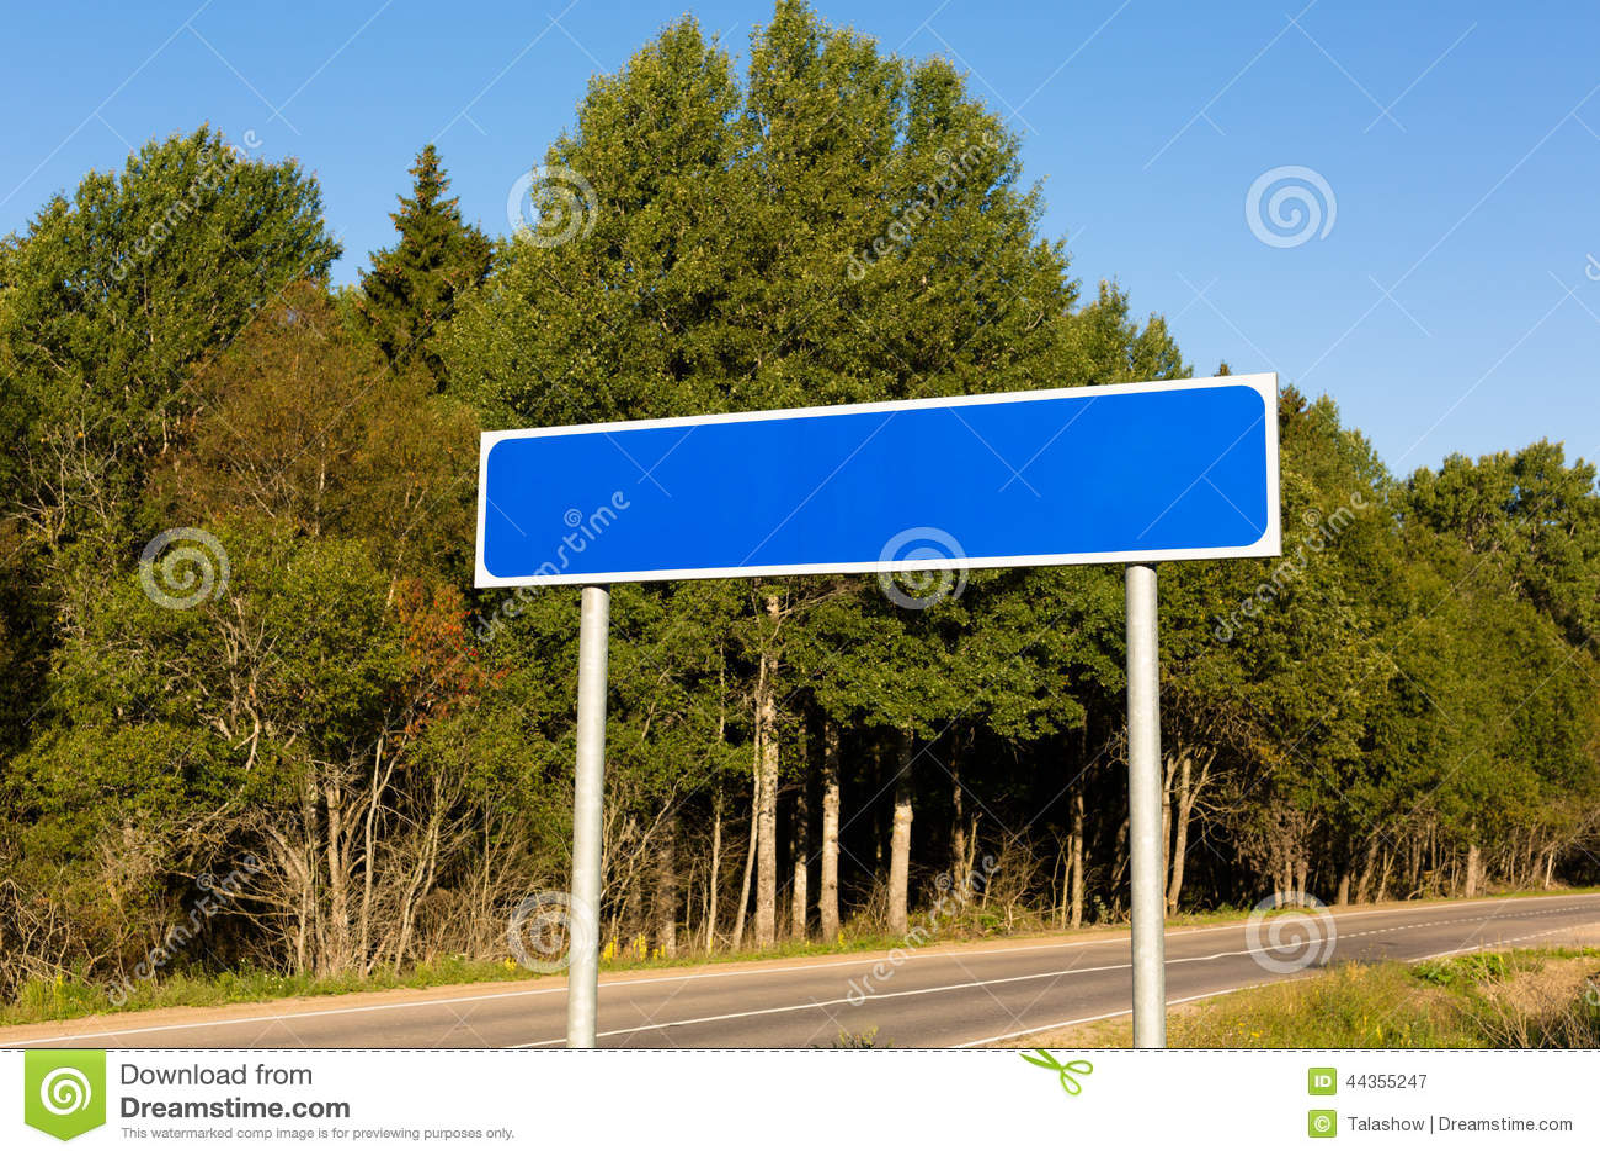 Segnale stradale blu in bianco